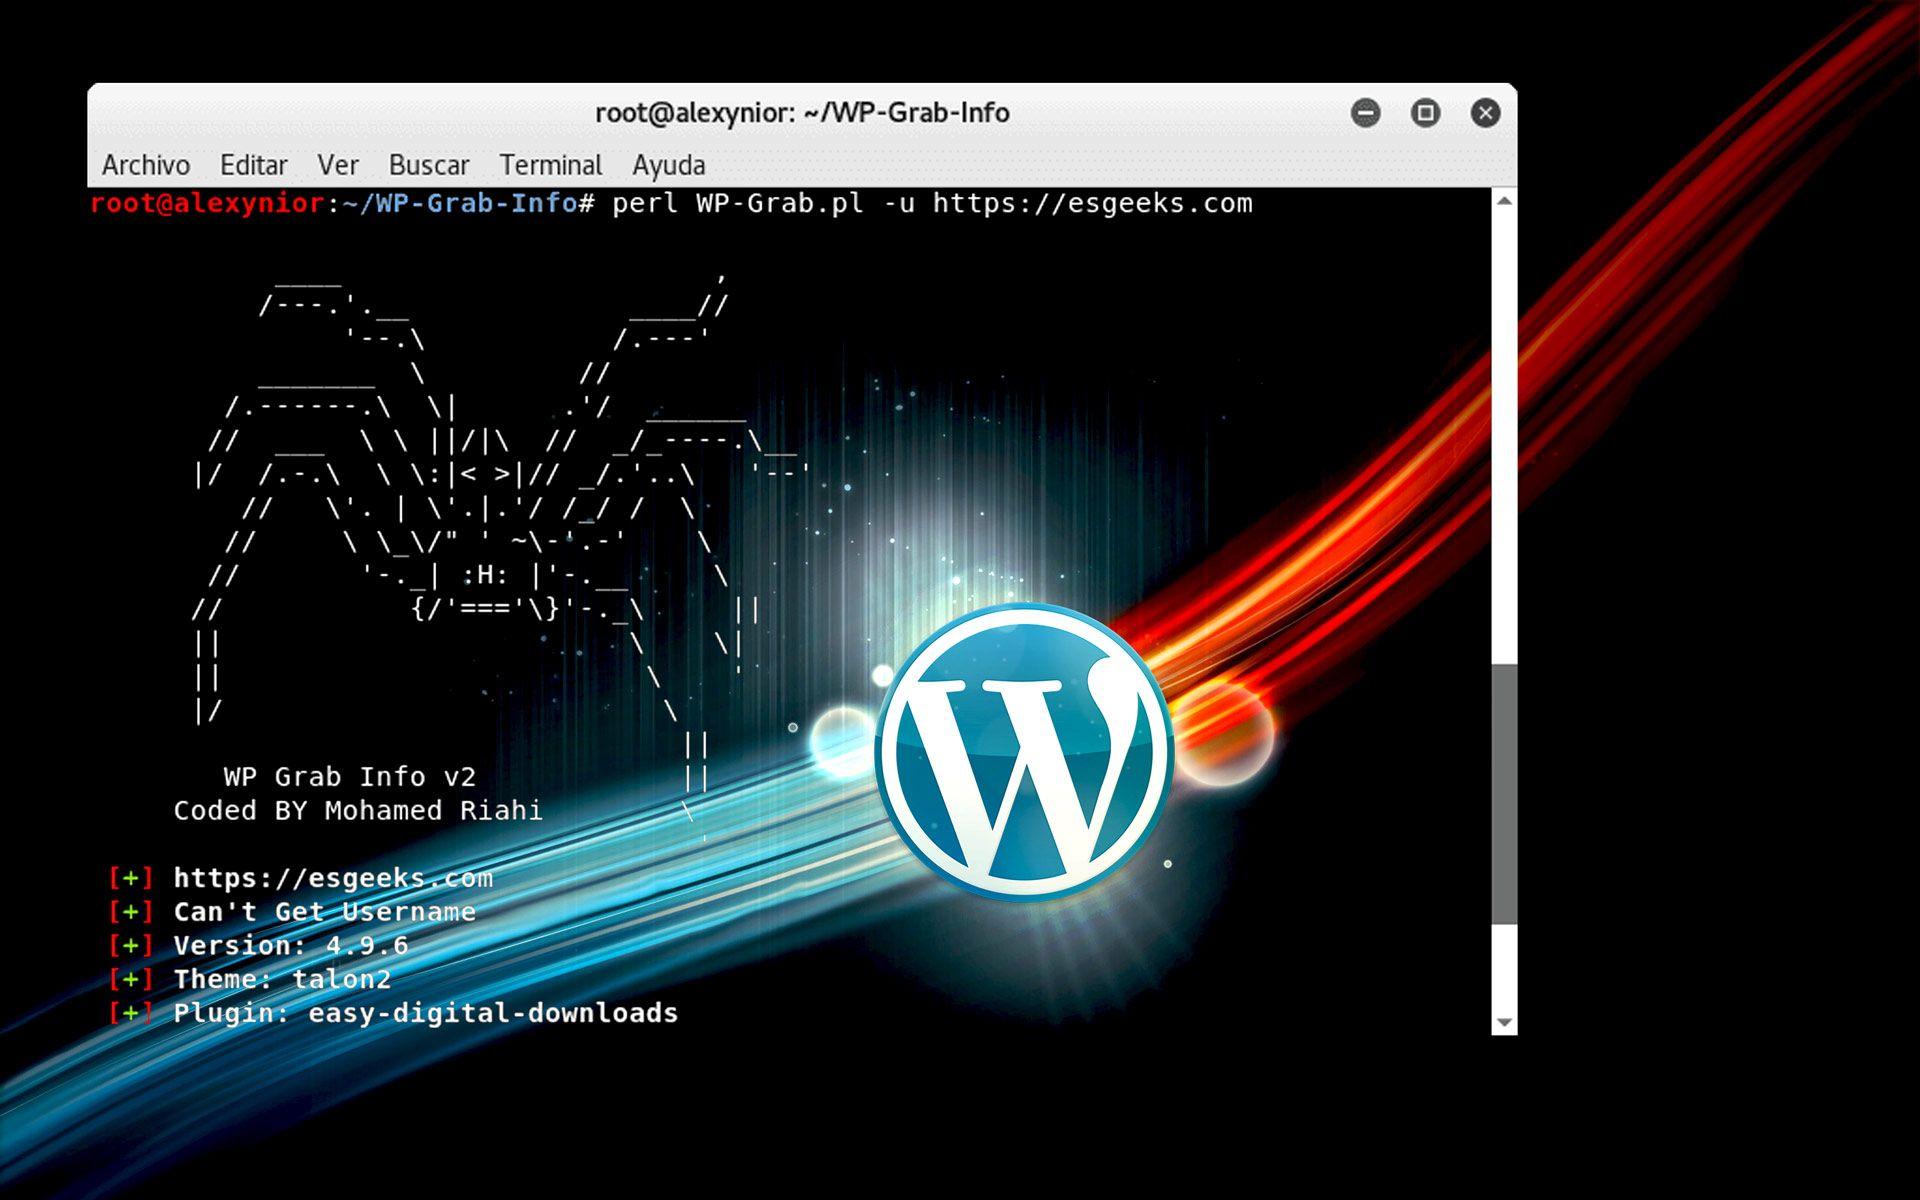 Detectar Usuario Versión Tema Plugins WordPress con WP-Grab-Info